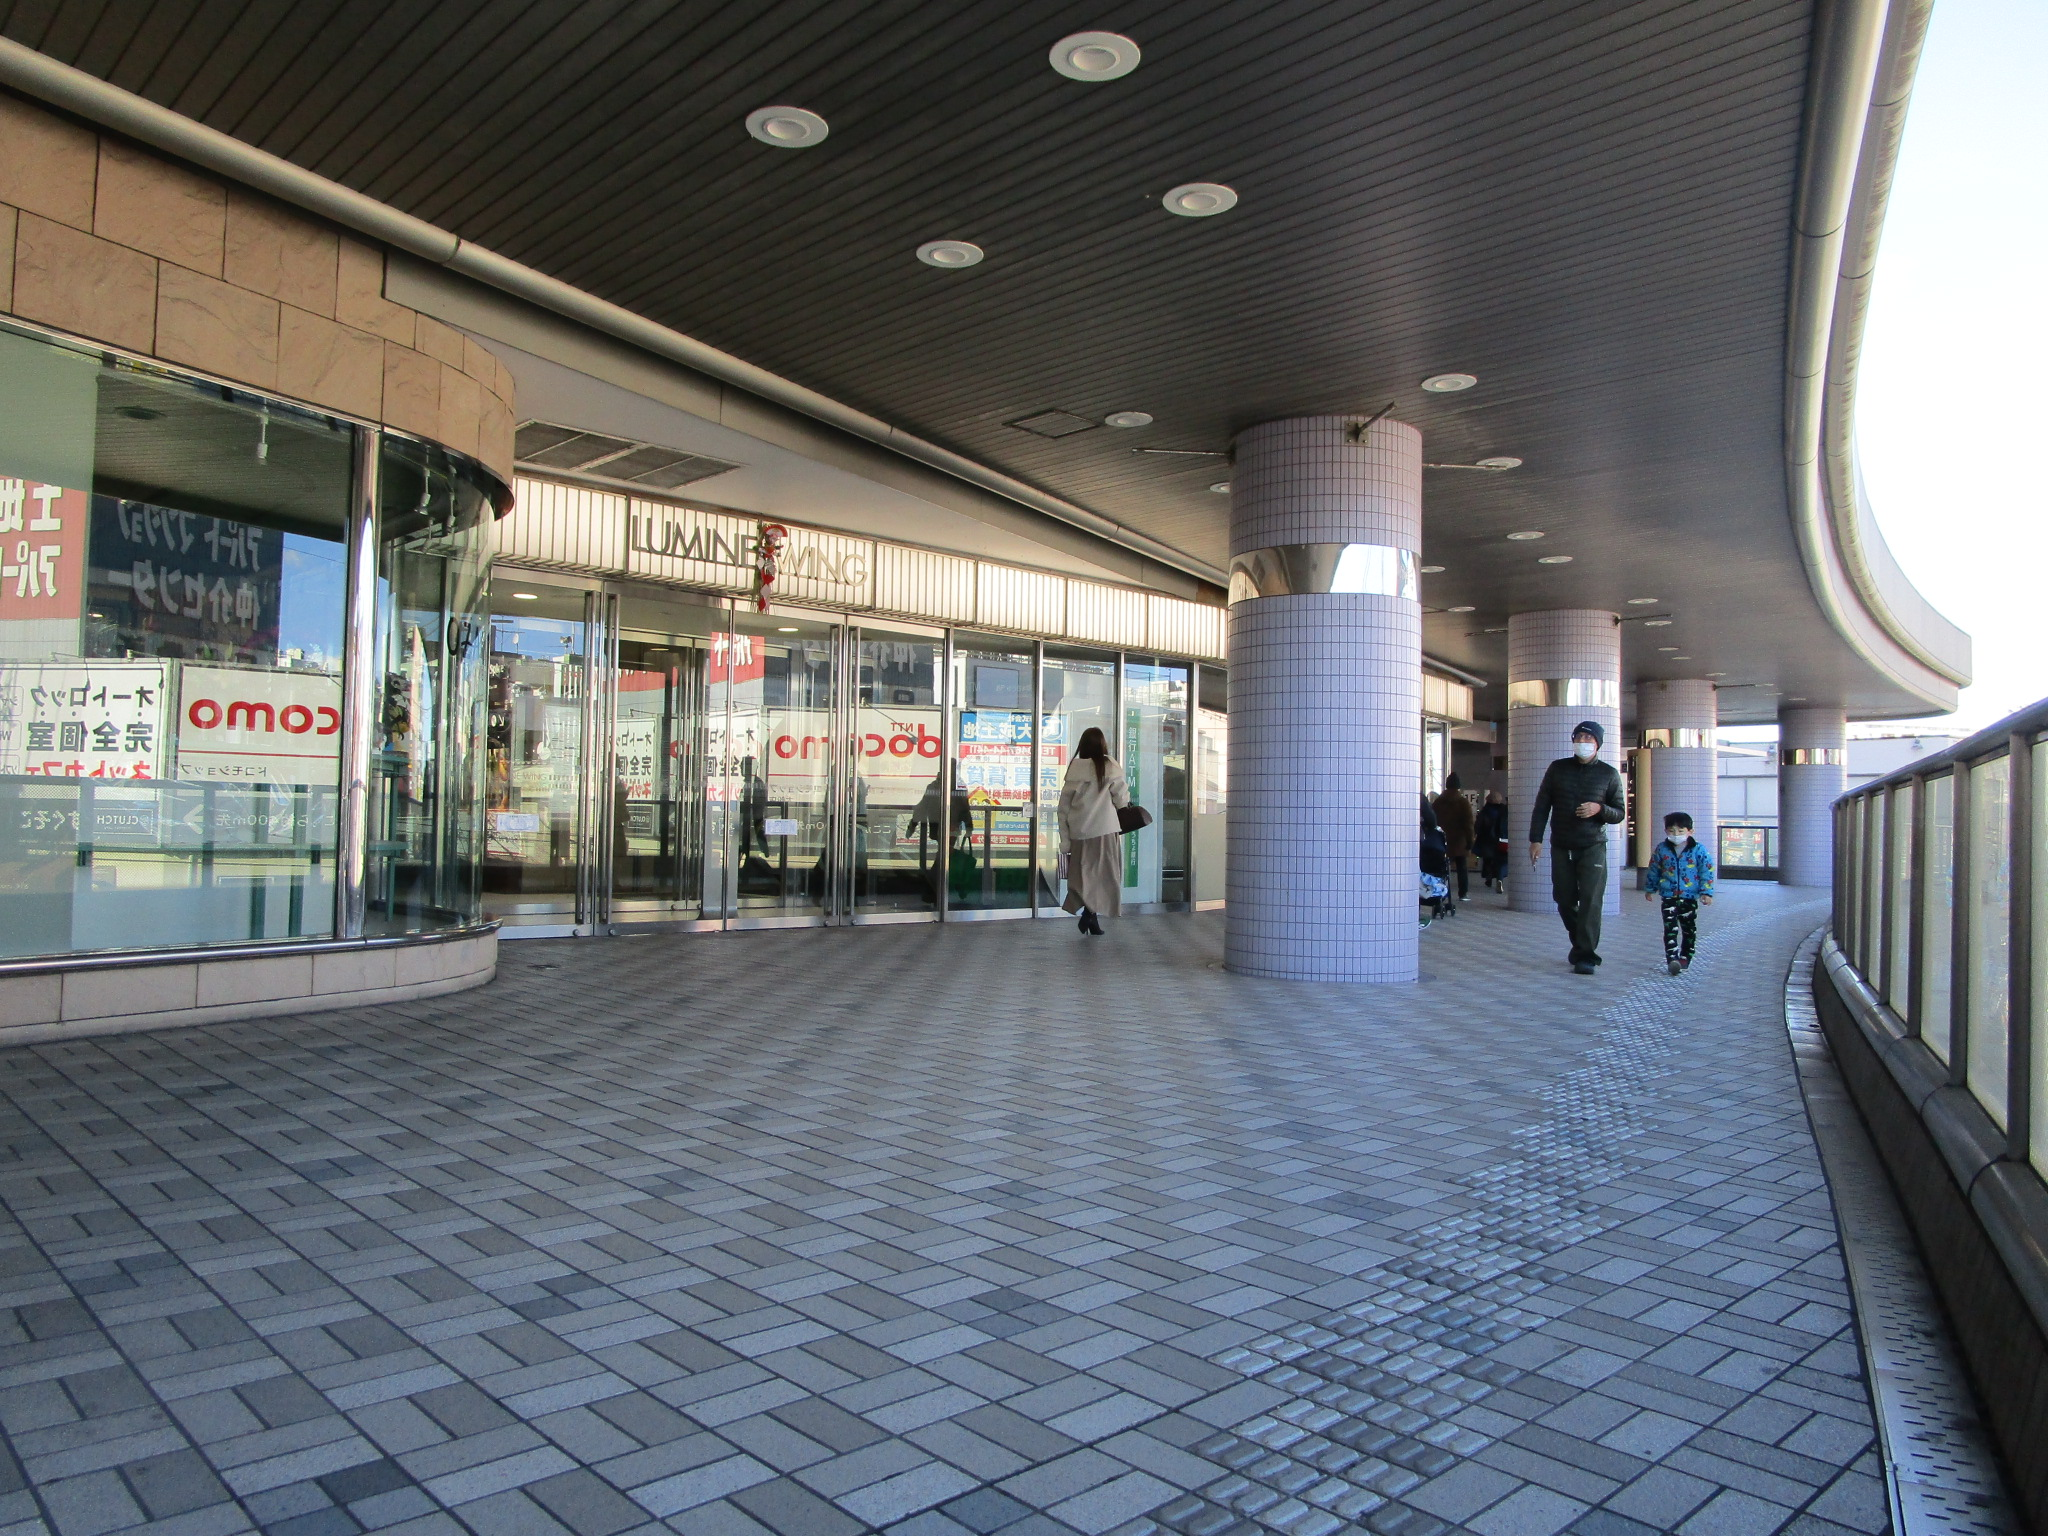 JR大船駅 ルミネウインドウ